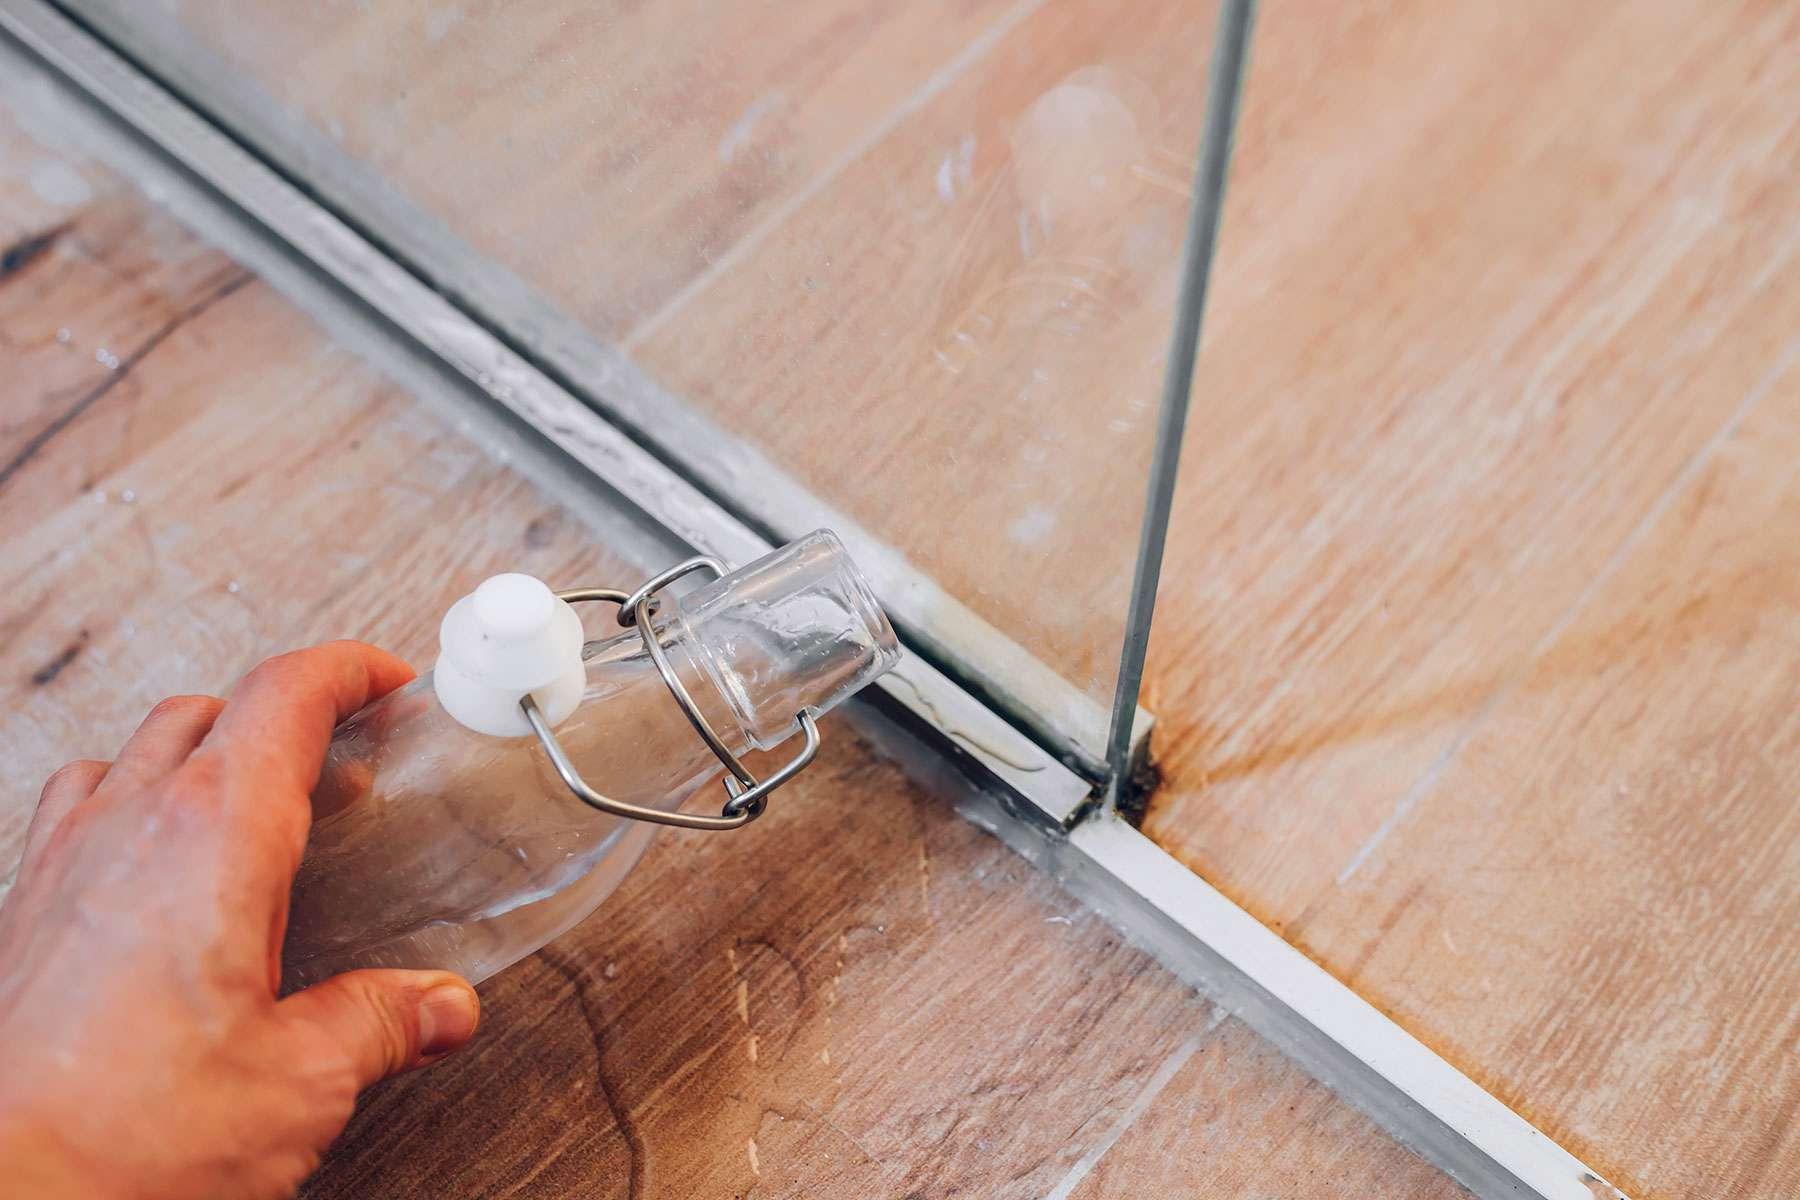 Glass shower door tracks covered with distilled white vinegar